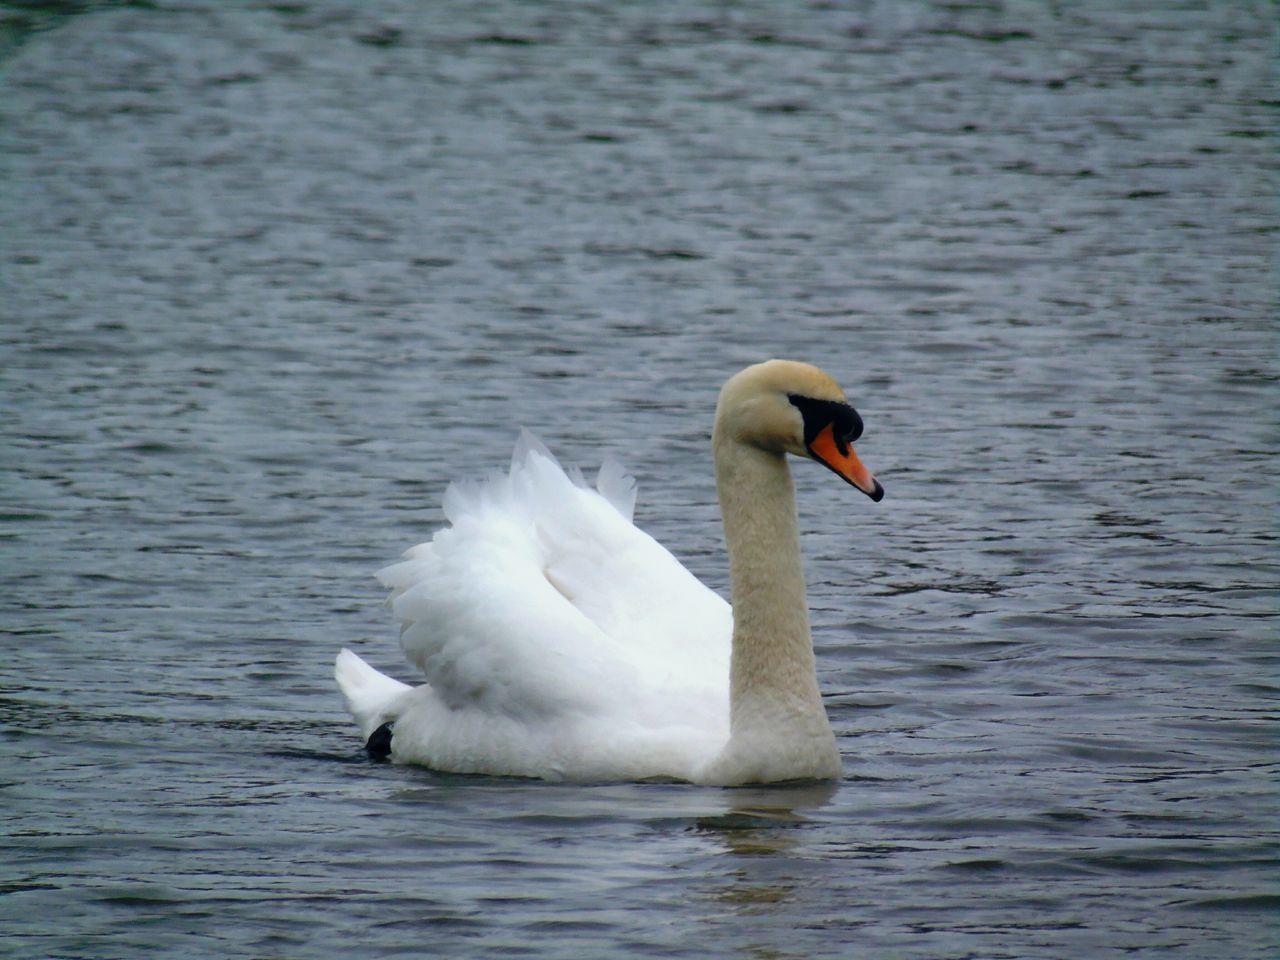 swan, animals in the wild, animal themes, bird, one animal, lake, water bird, animal wildlife, white color, swimming, water, beak, no people, nature, day, outdoors, close-up